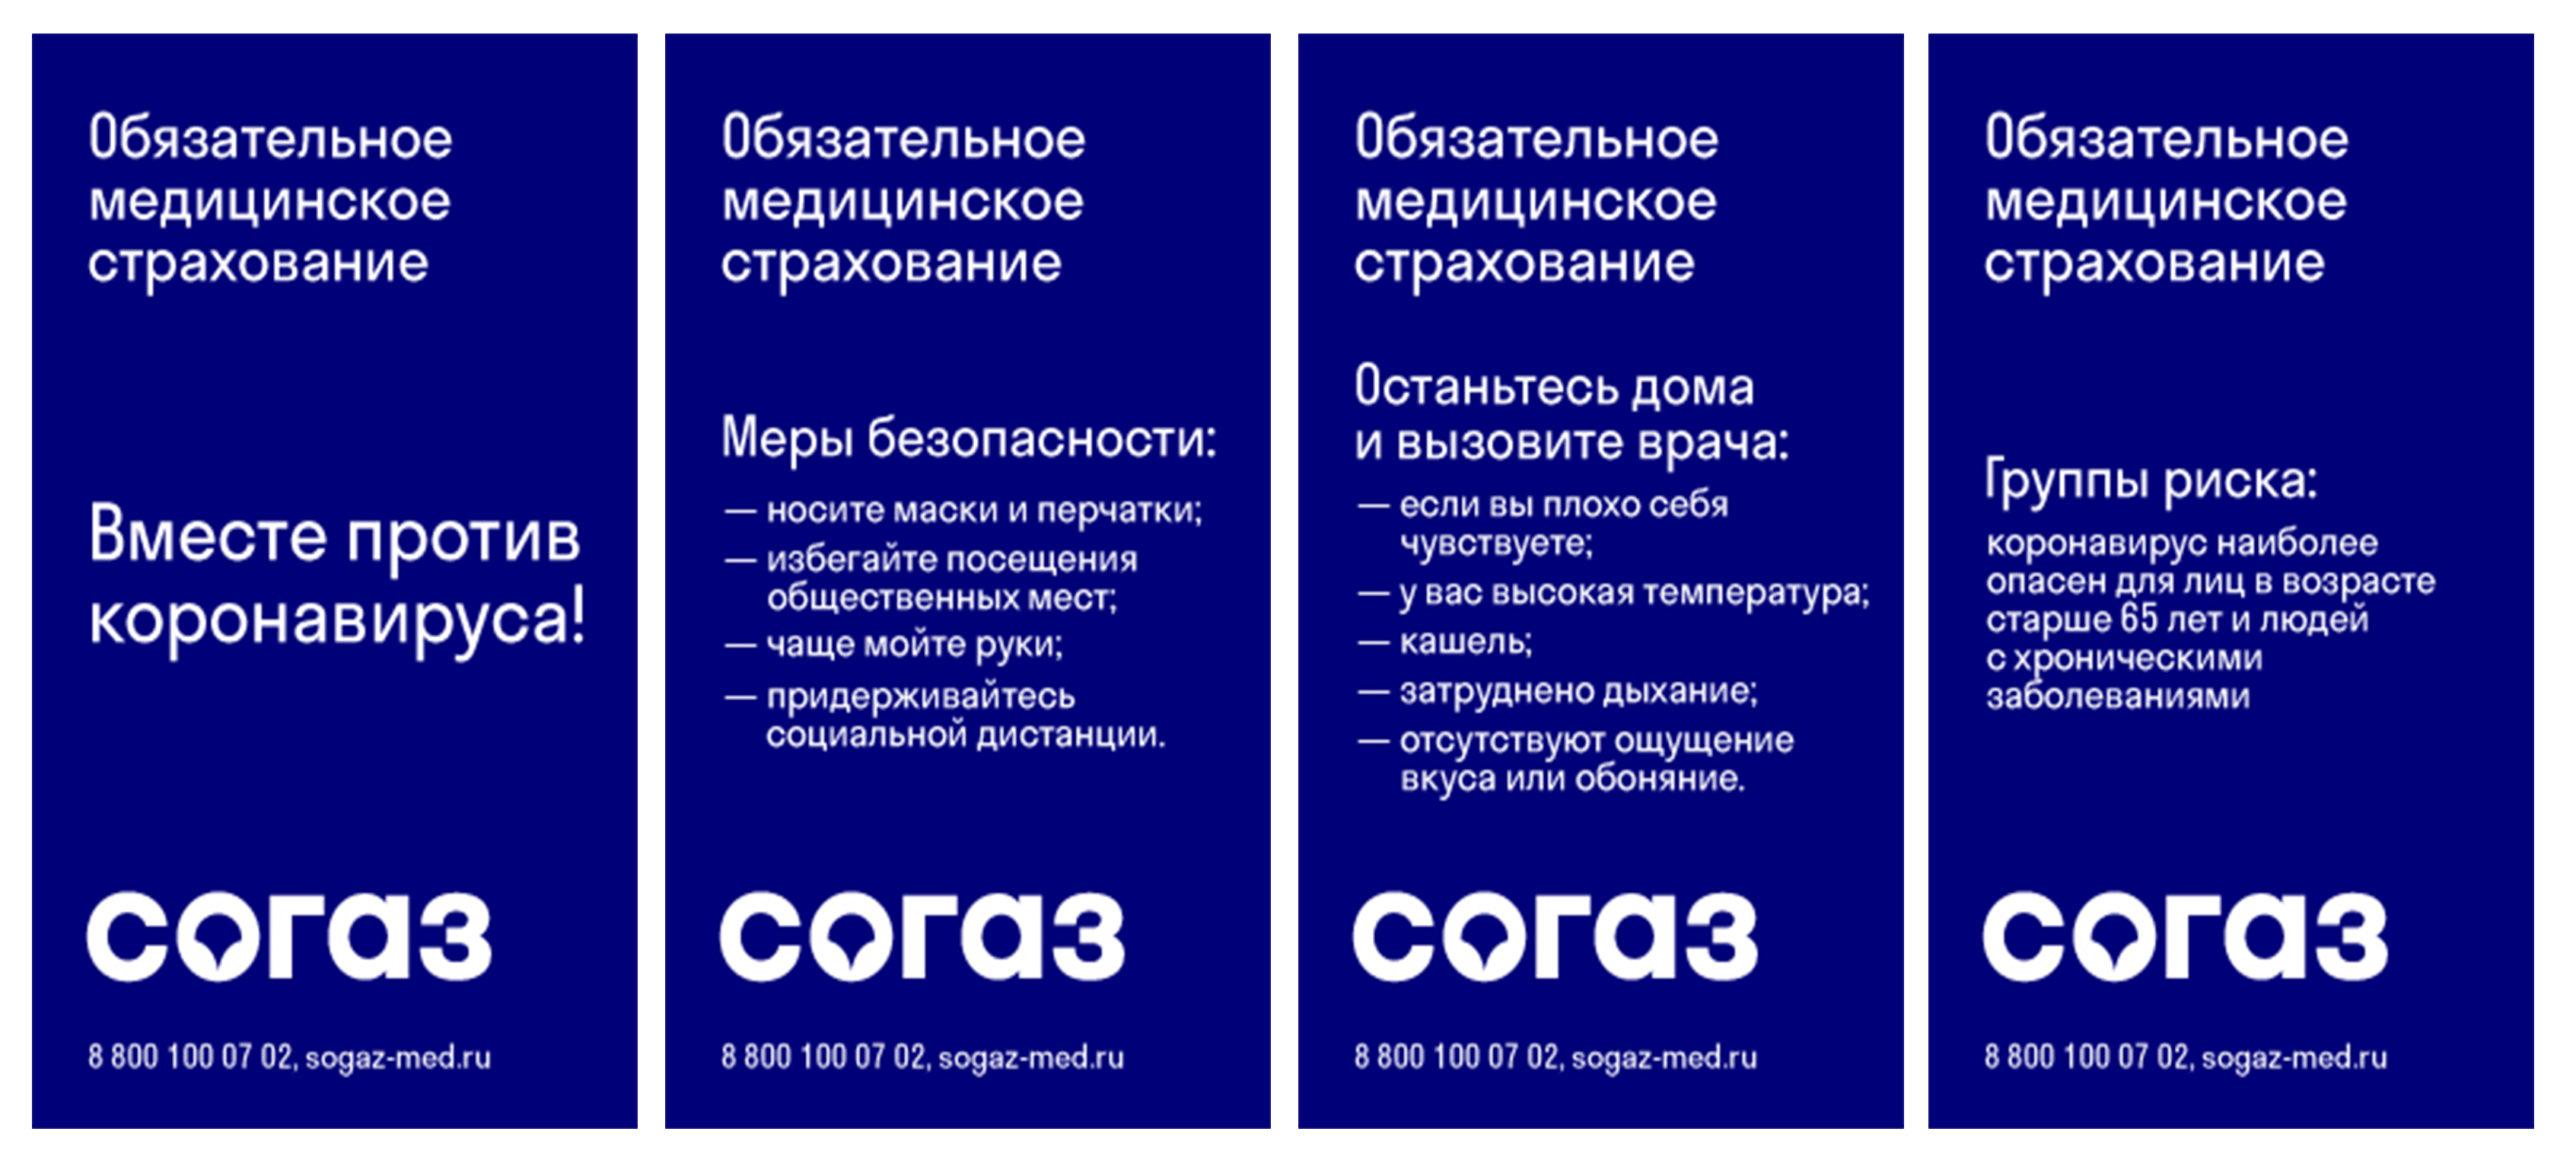 Права пациентов при заражении коронавирусом